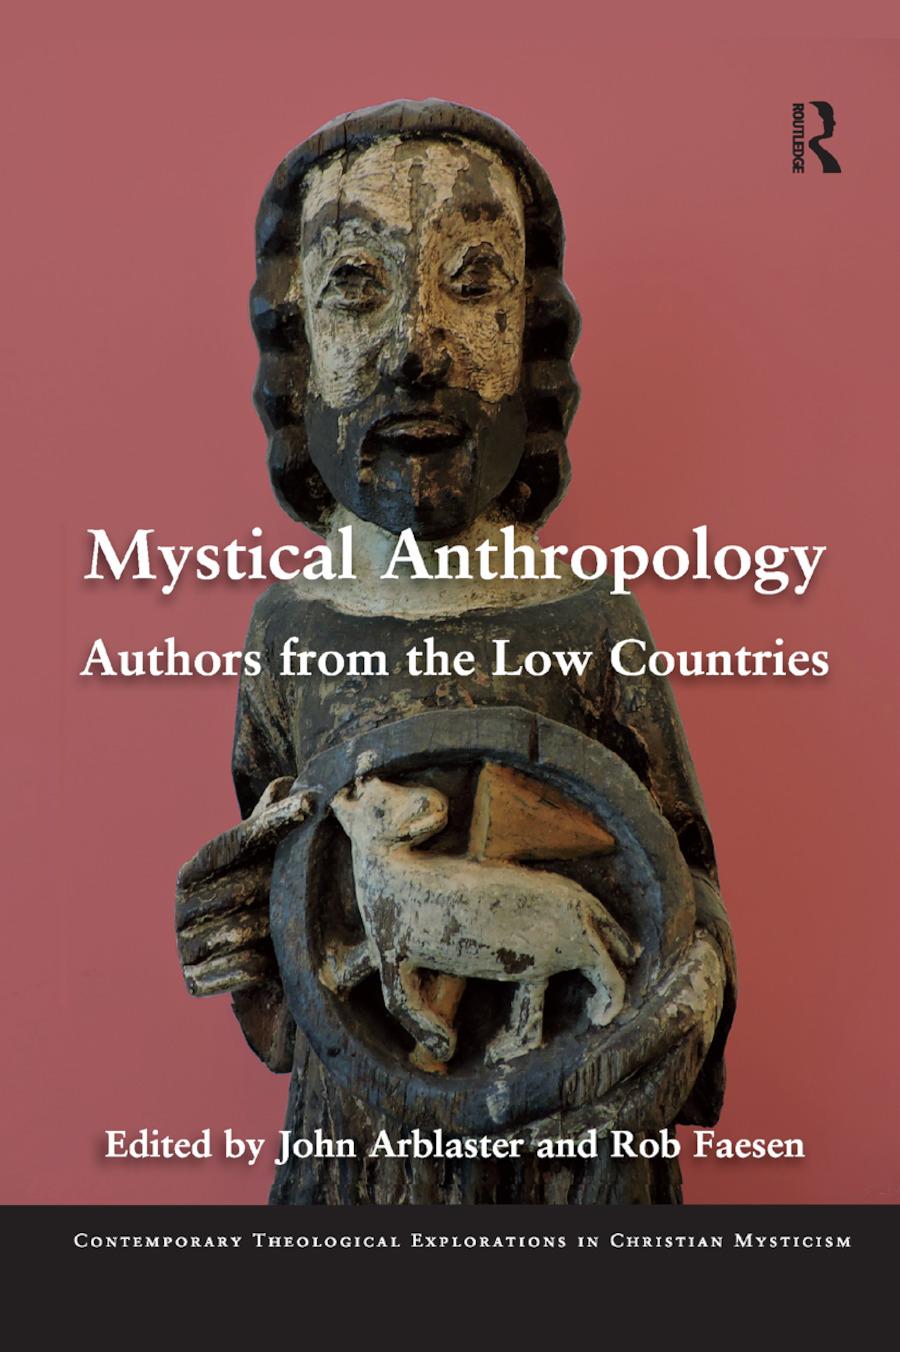 Mystical Anthropology